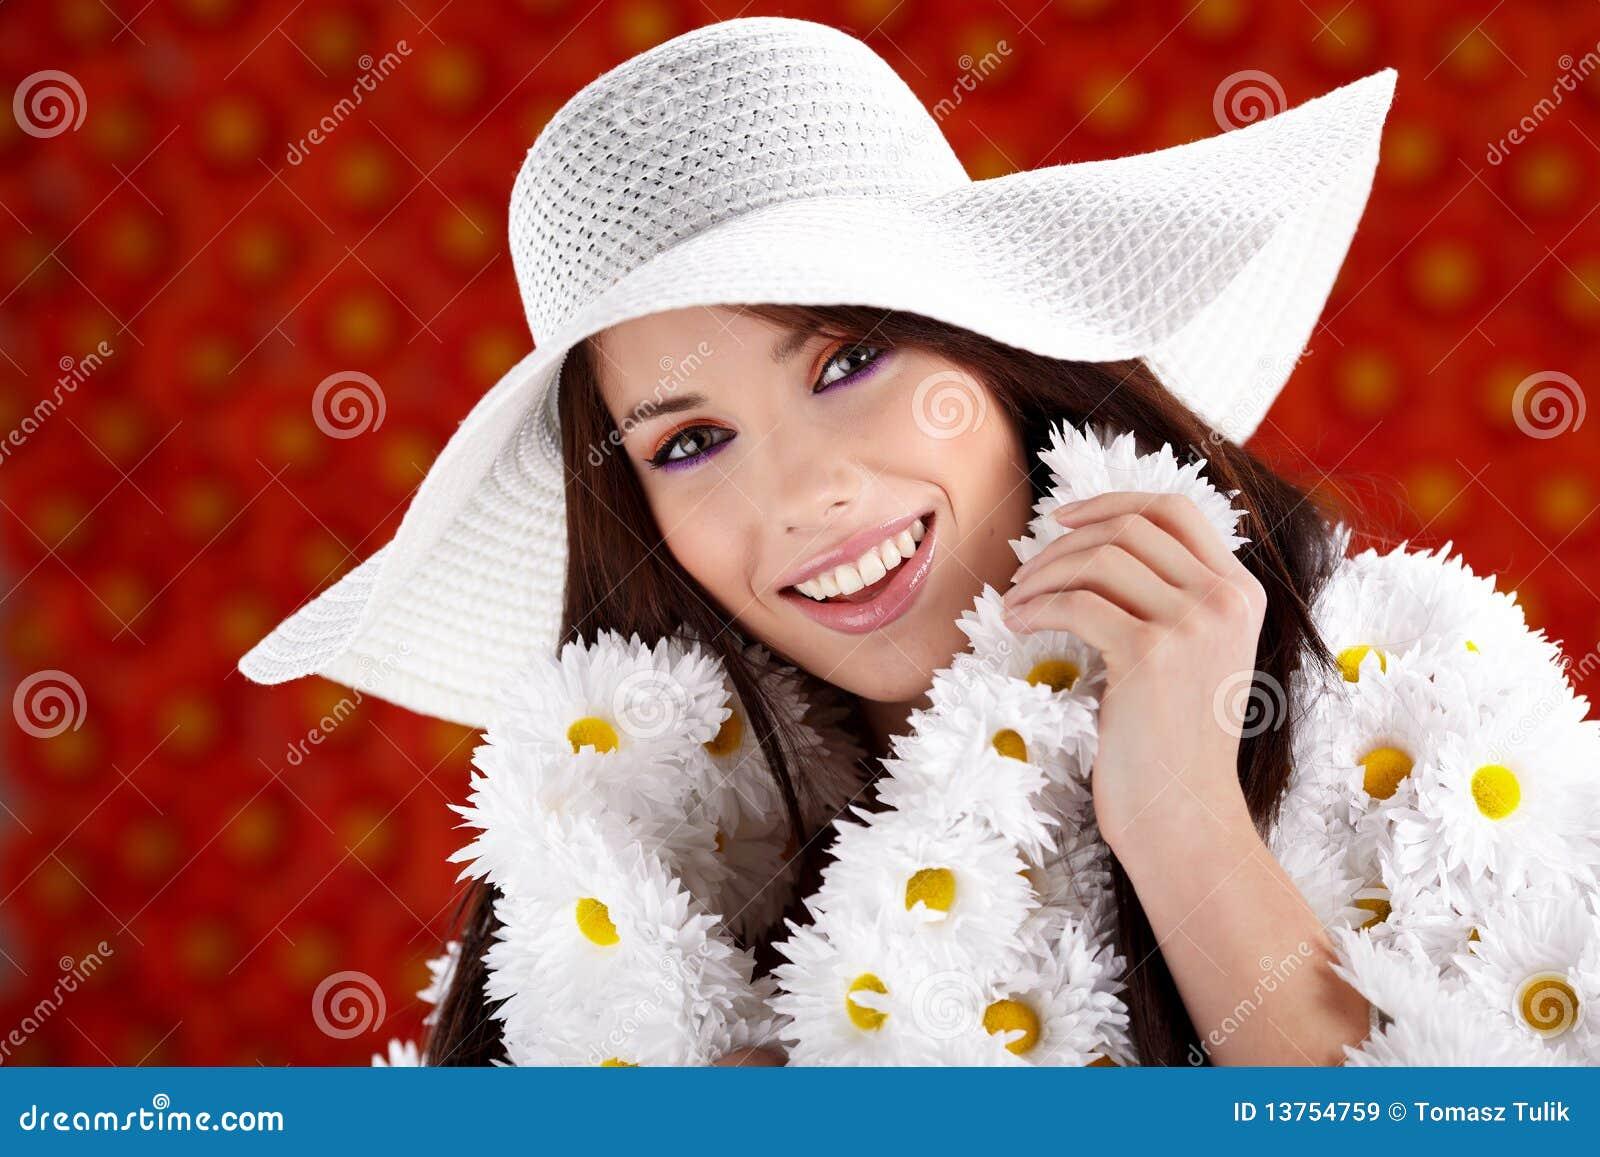 Woman dressed flower coat